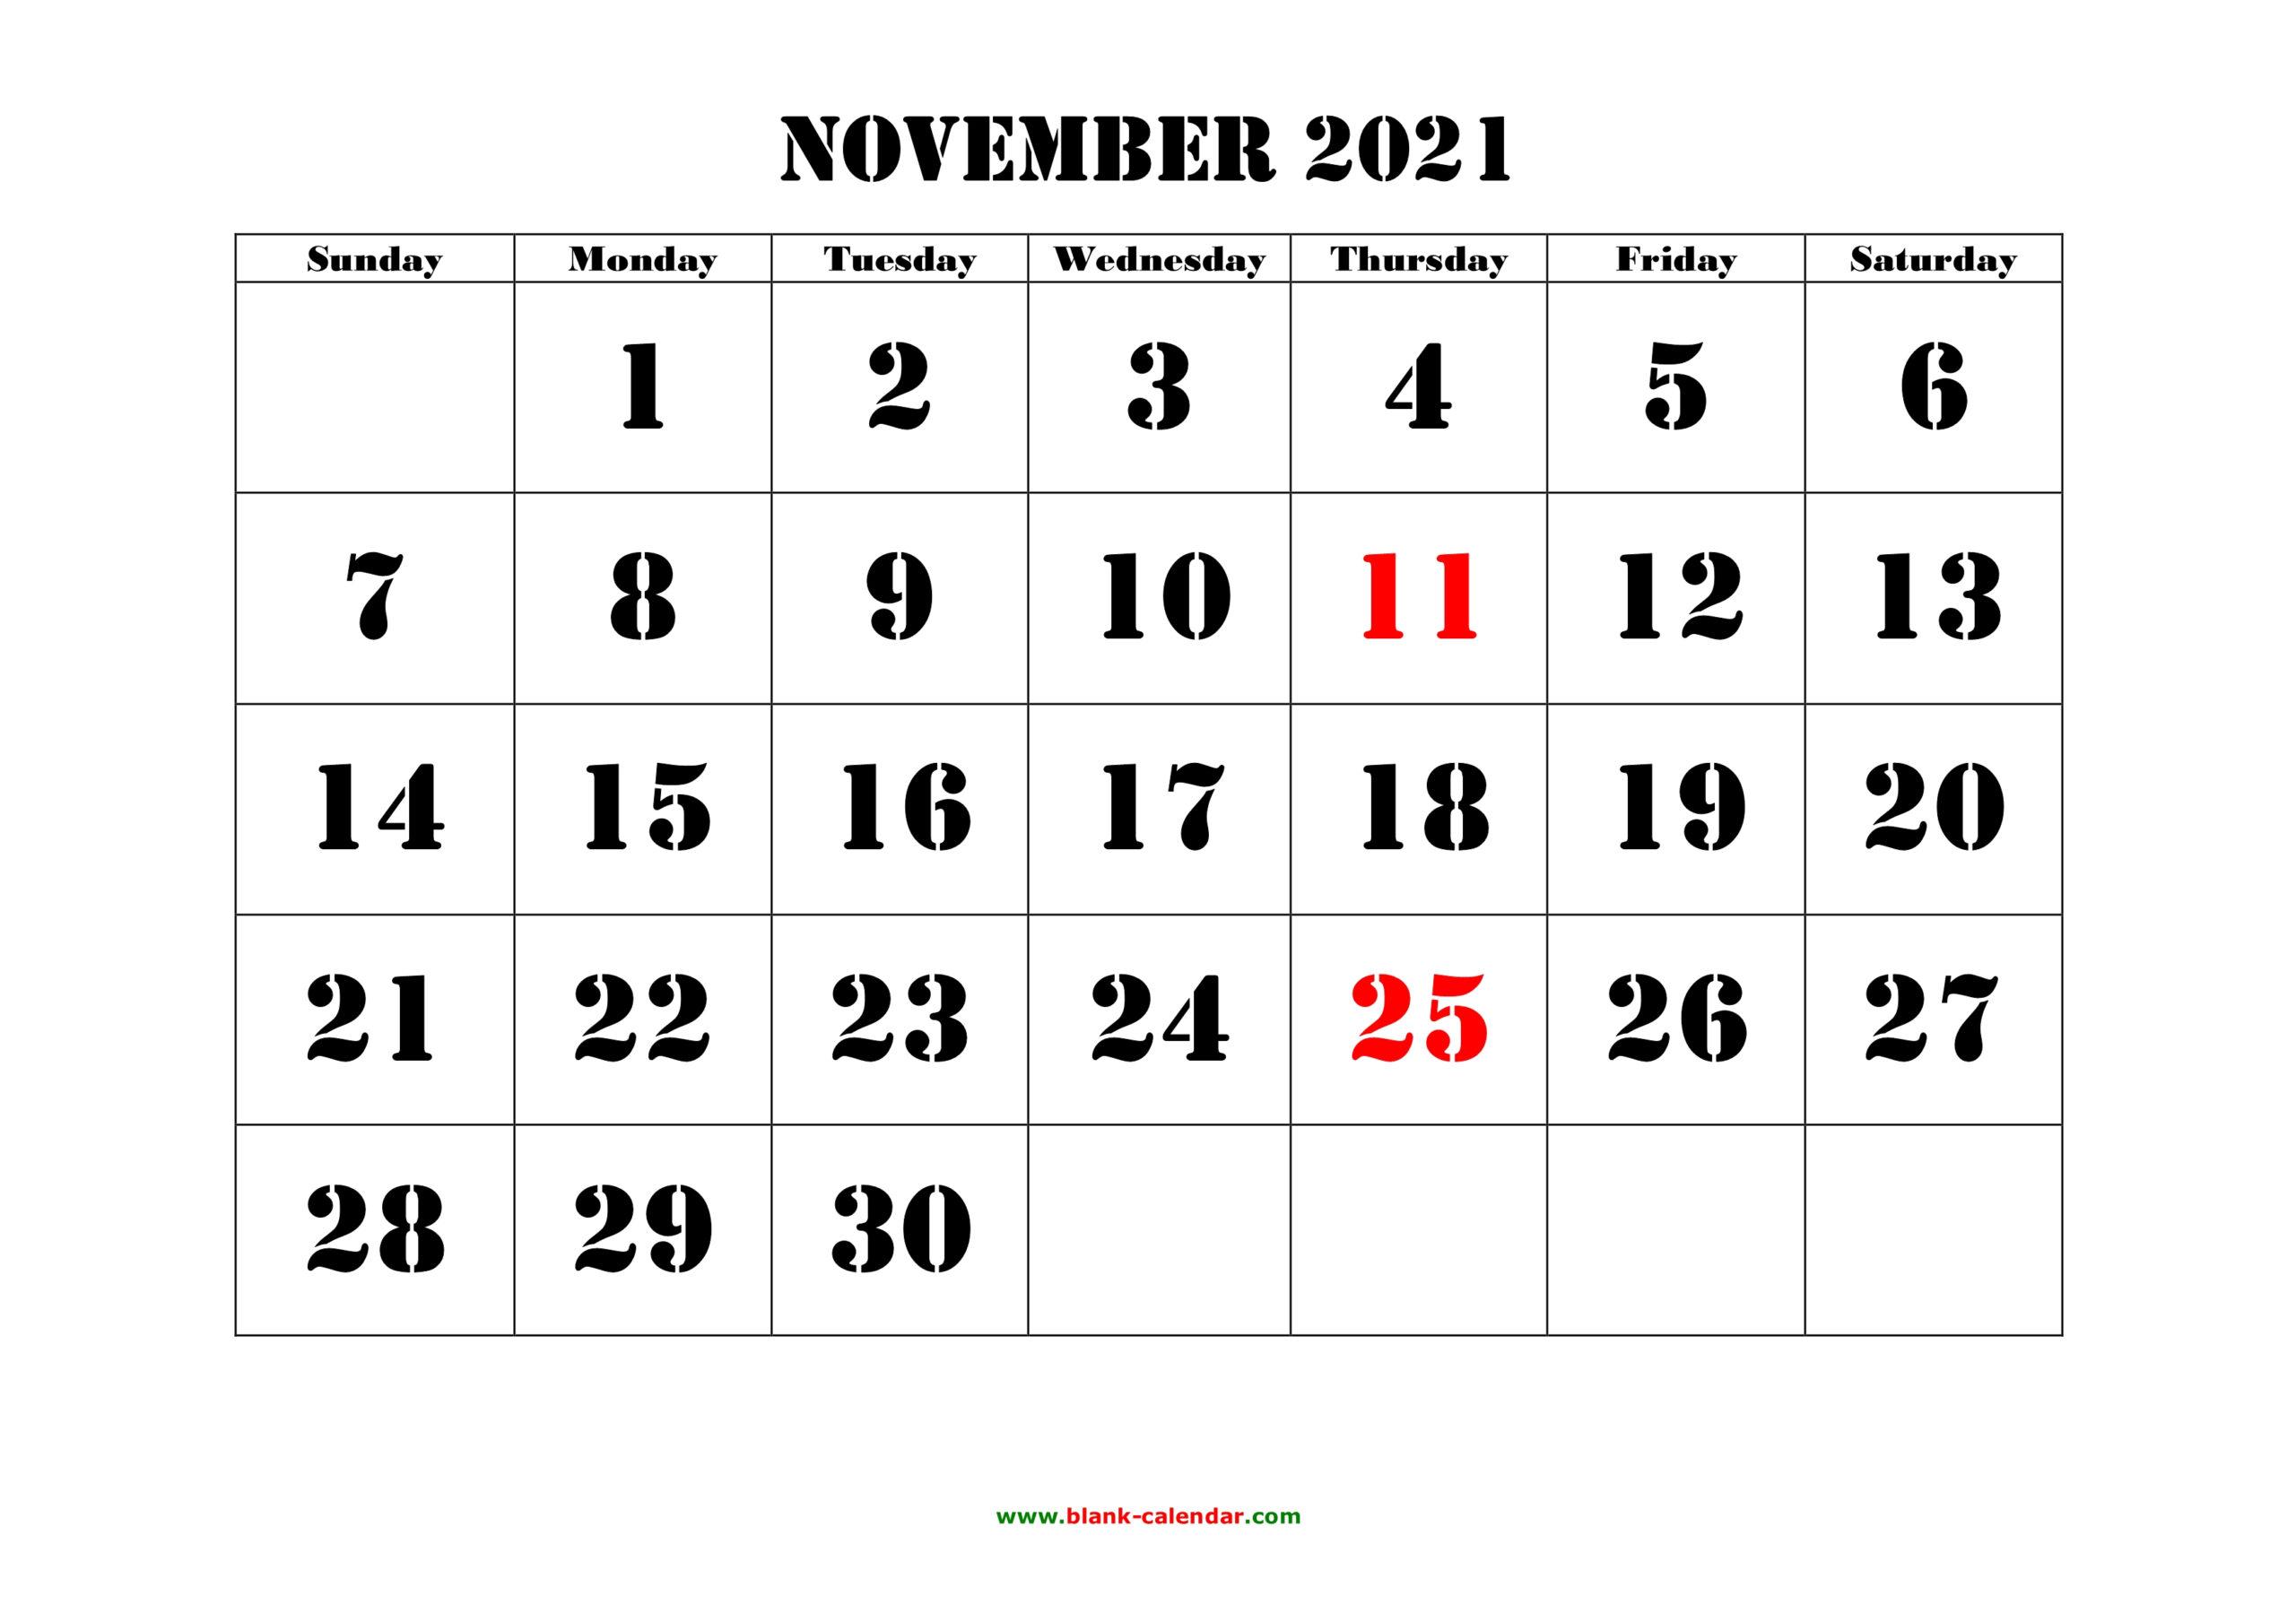 November 2021 Printable Calendar | Free Download Monthly